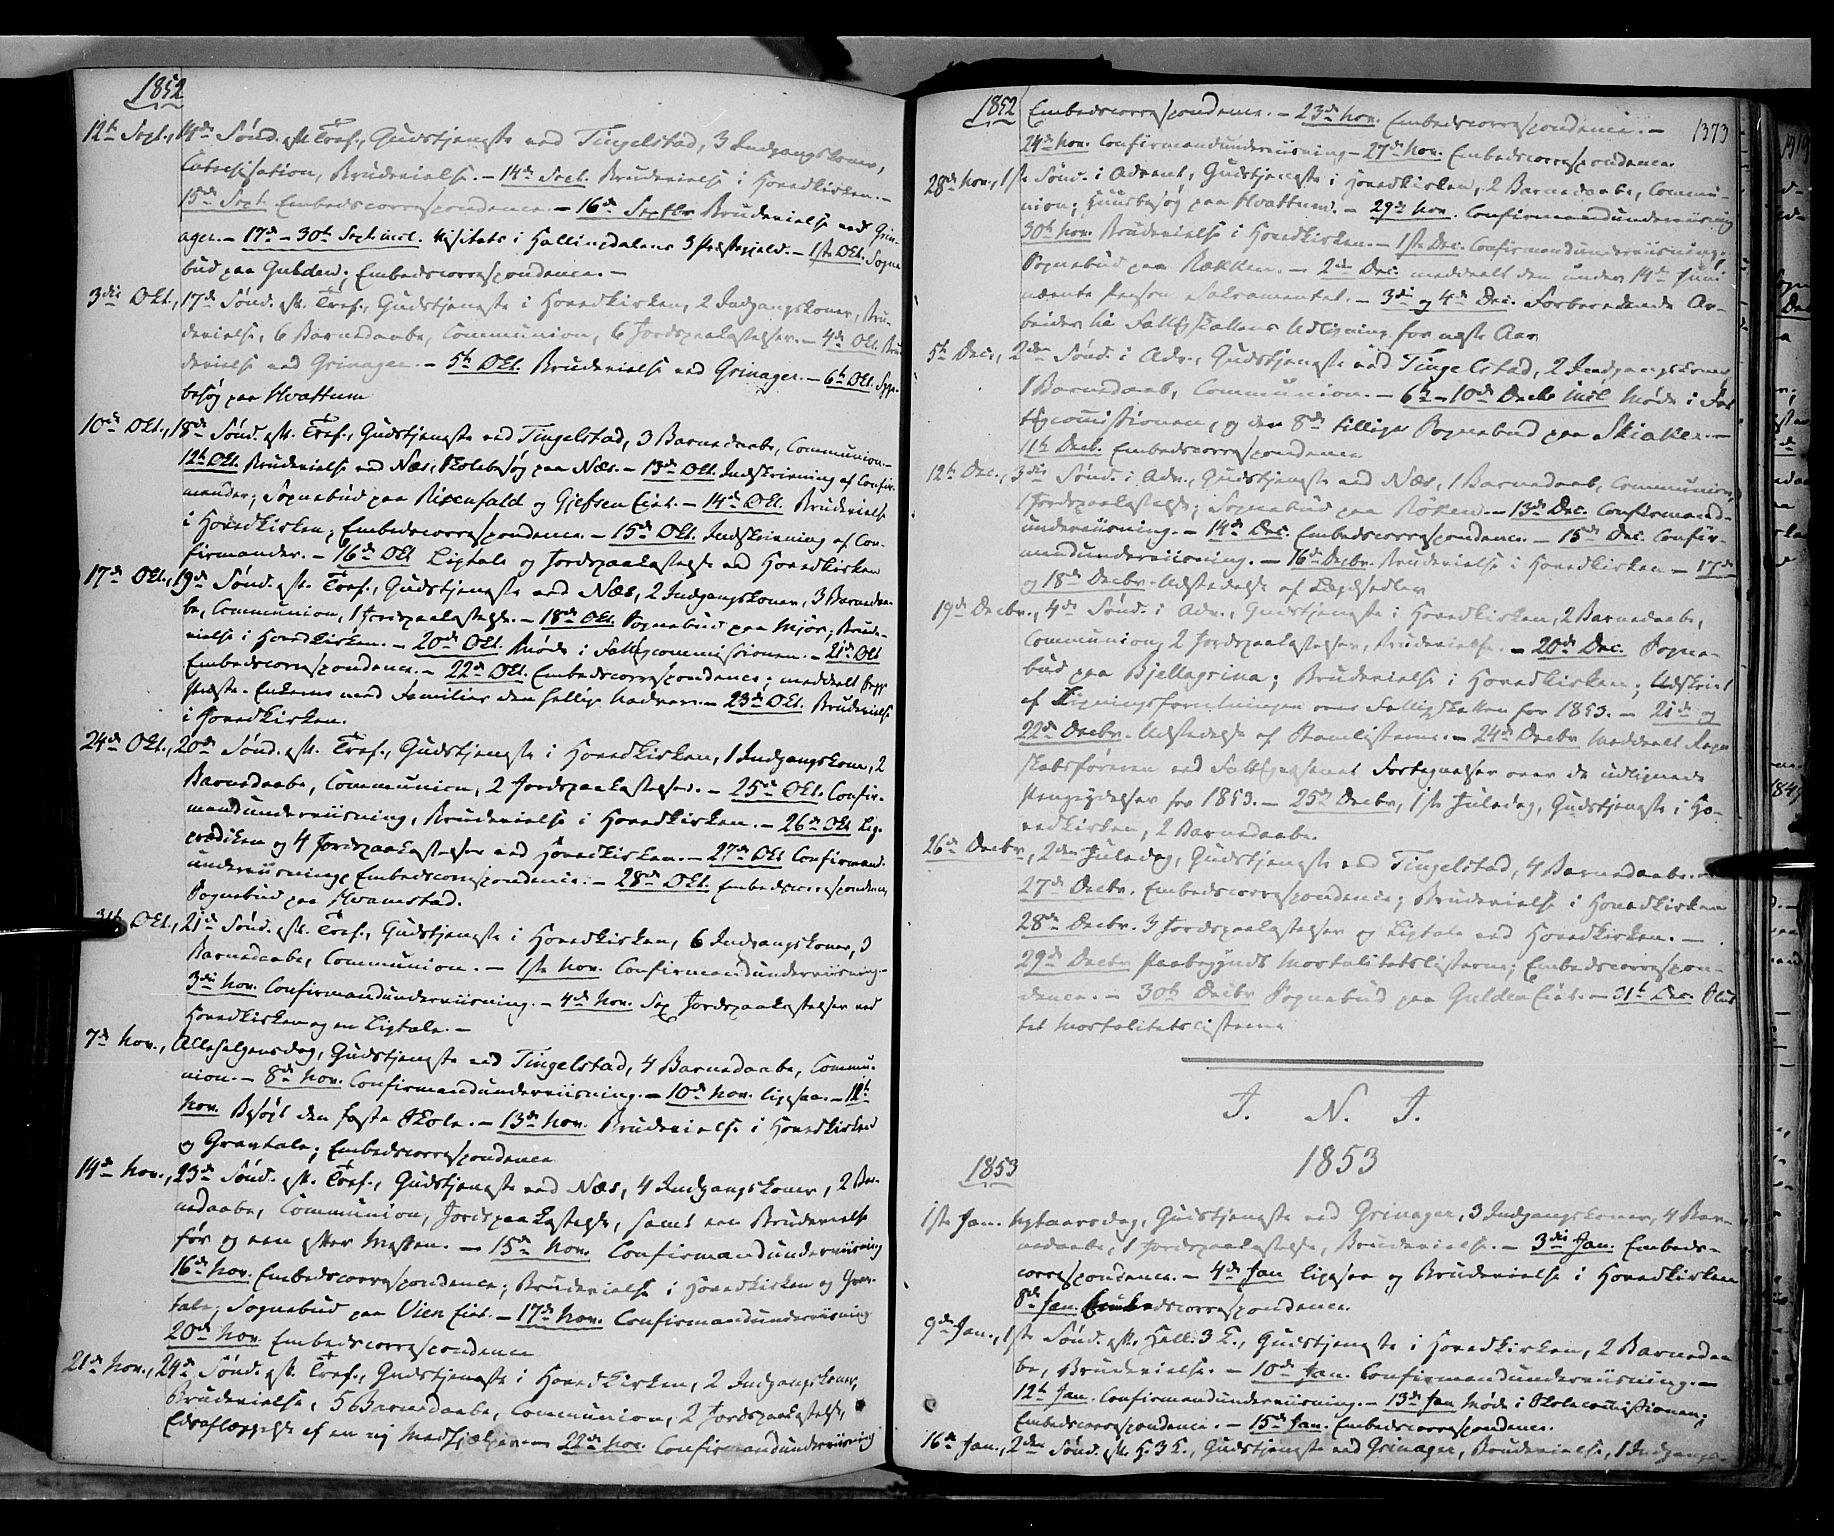 SAH, Gran prestekontor, Ministerialbok nr. 11, 1842-1856, s. 1372-1373